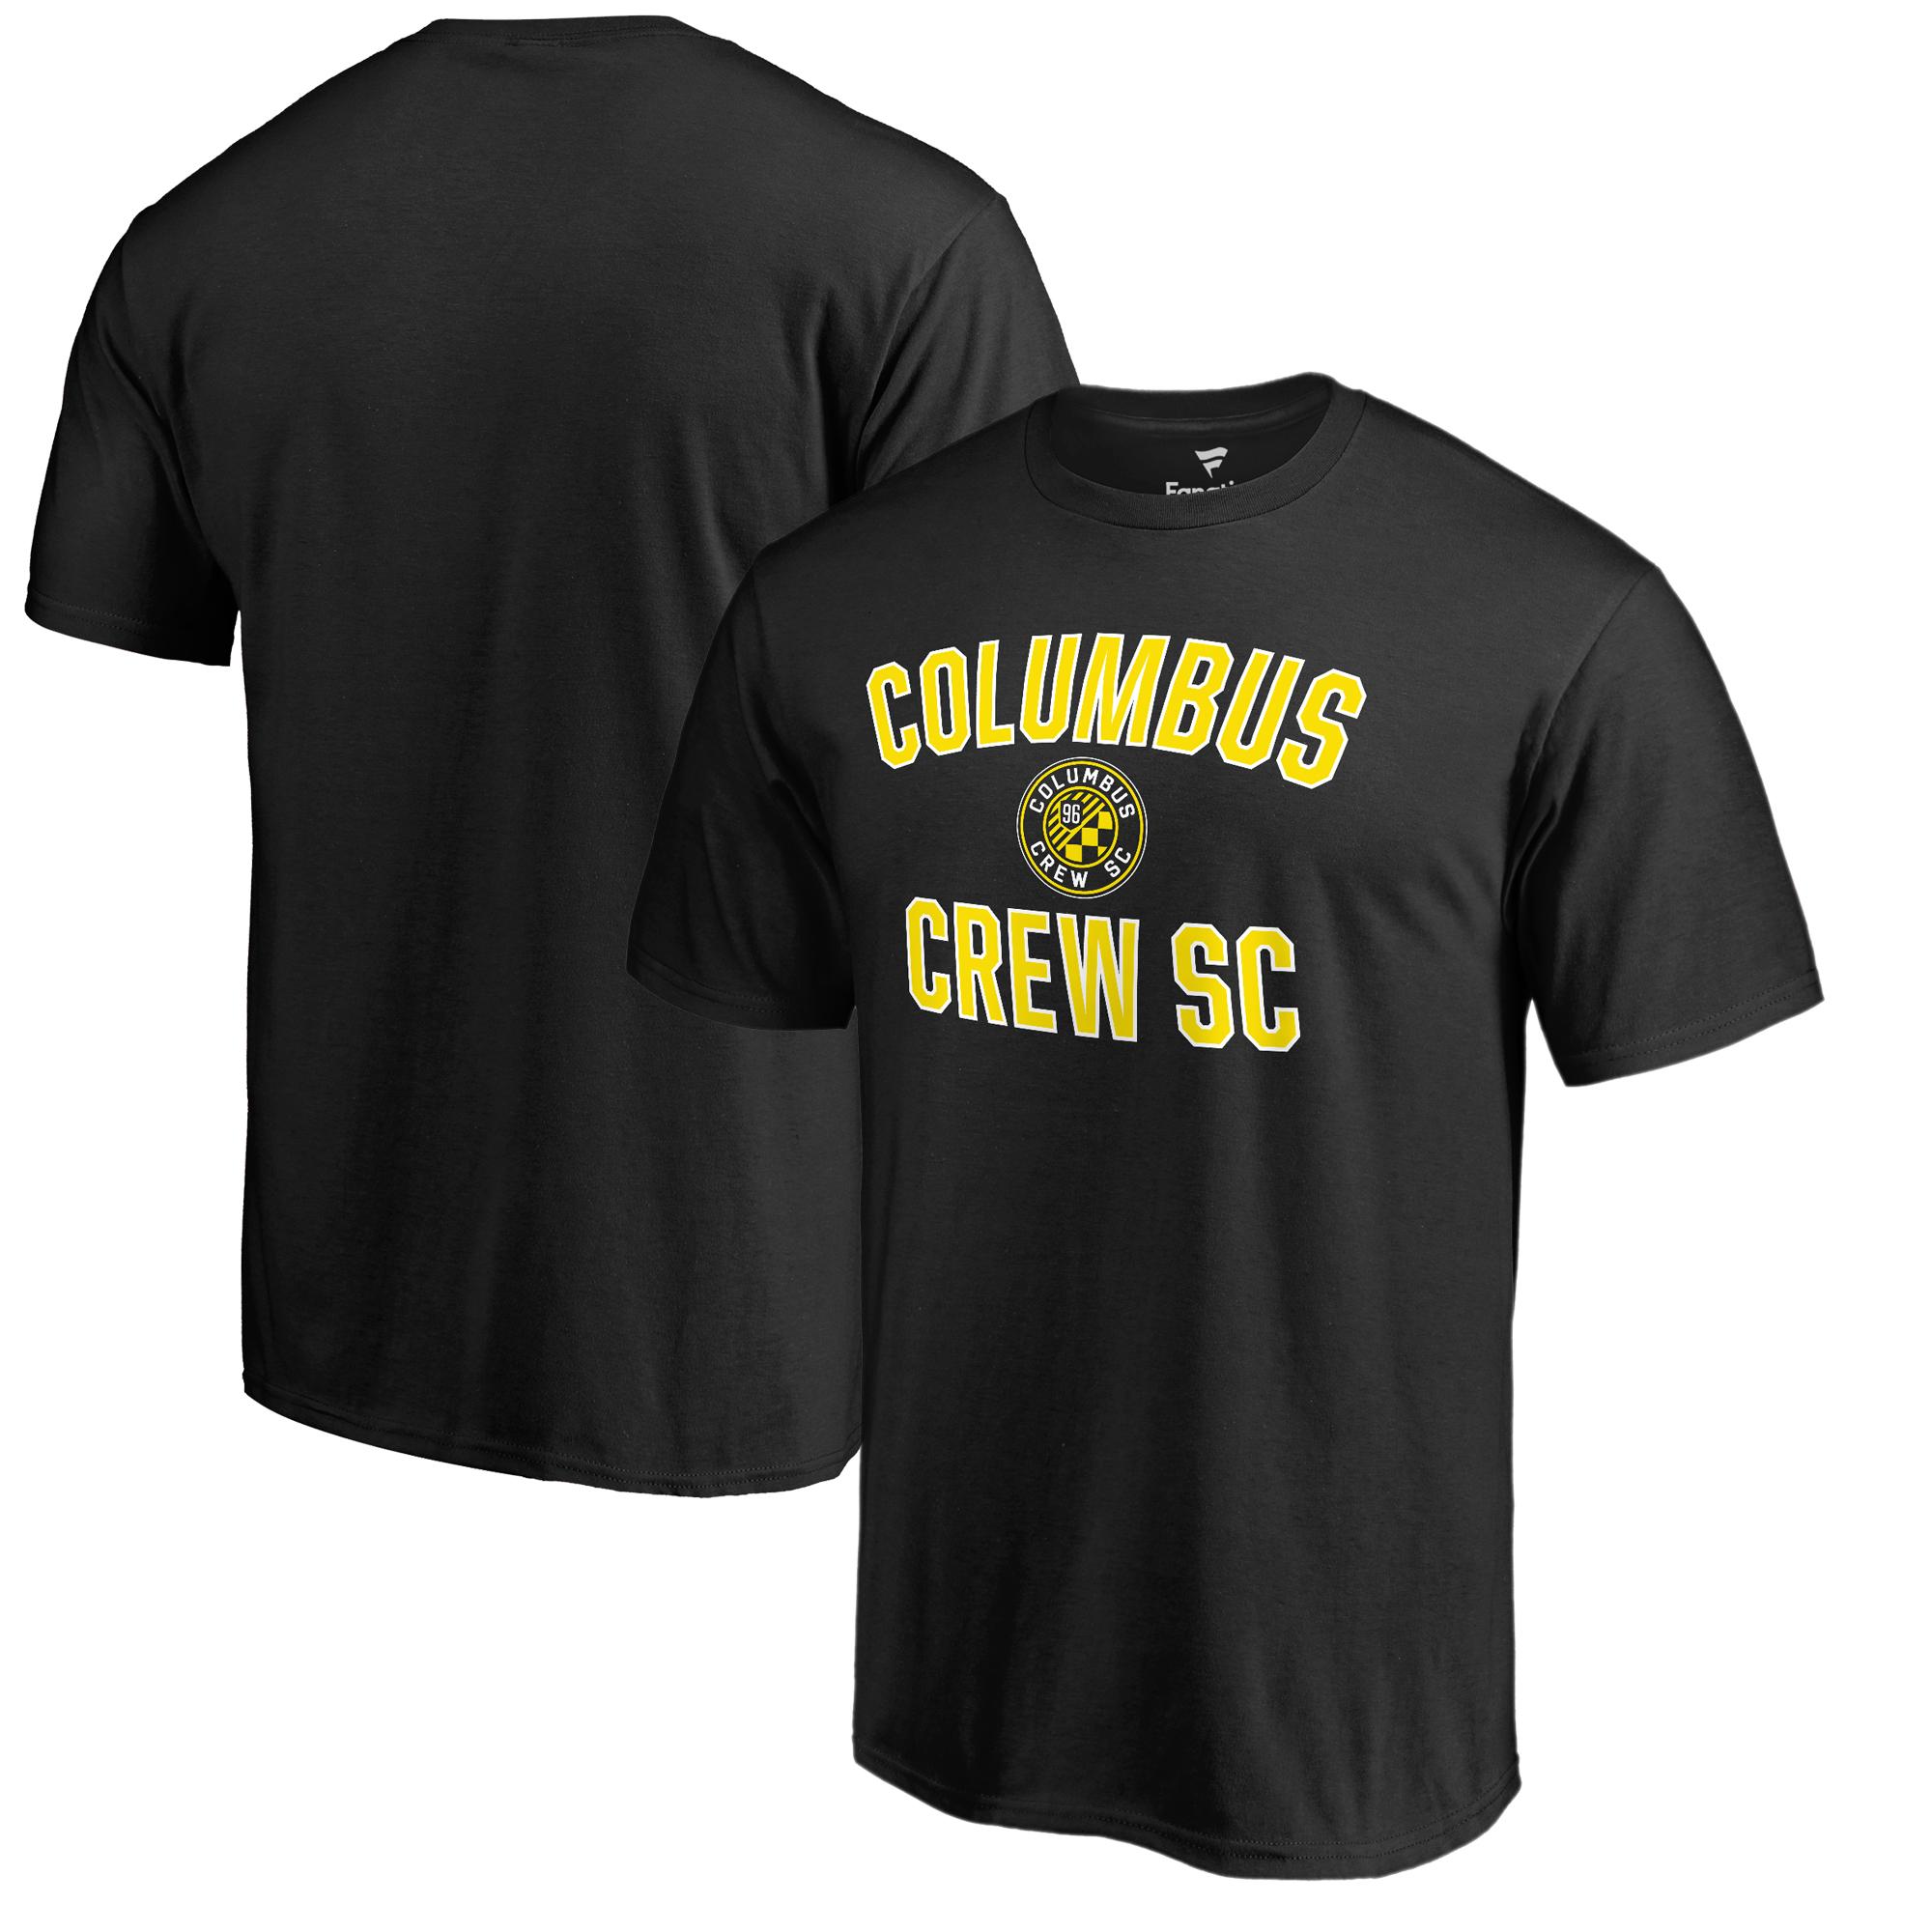 Columbus Crew SC Fanatics Branded Victory Arch T-Shirt - Black